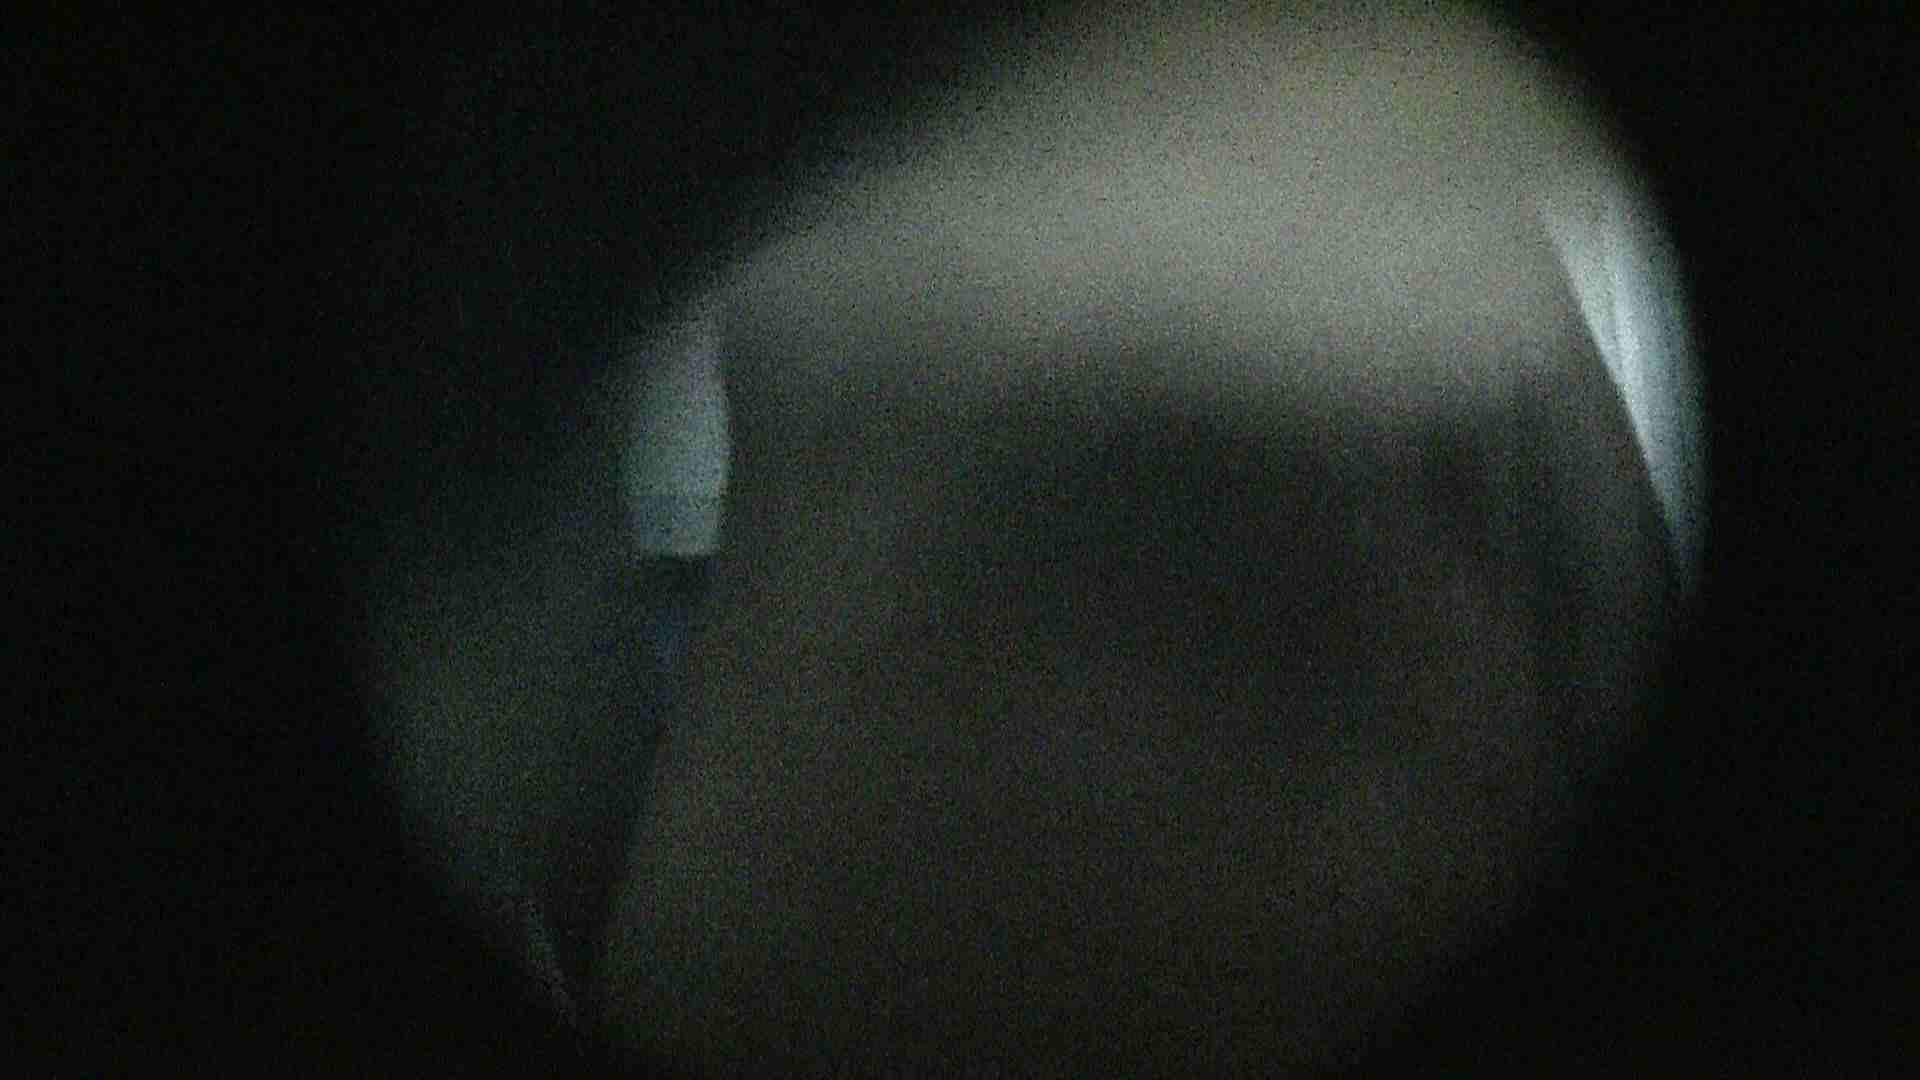 NO.13 暗いですが豪快な砂落としが好印象 シャワー | シャワー室  88PIX 76